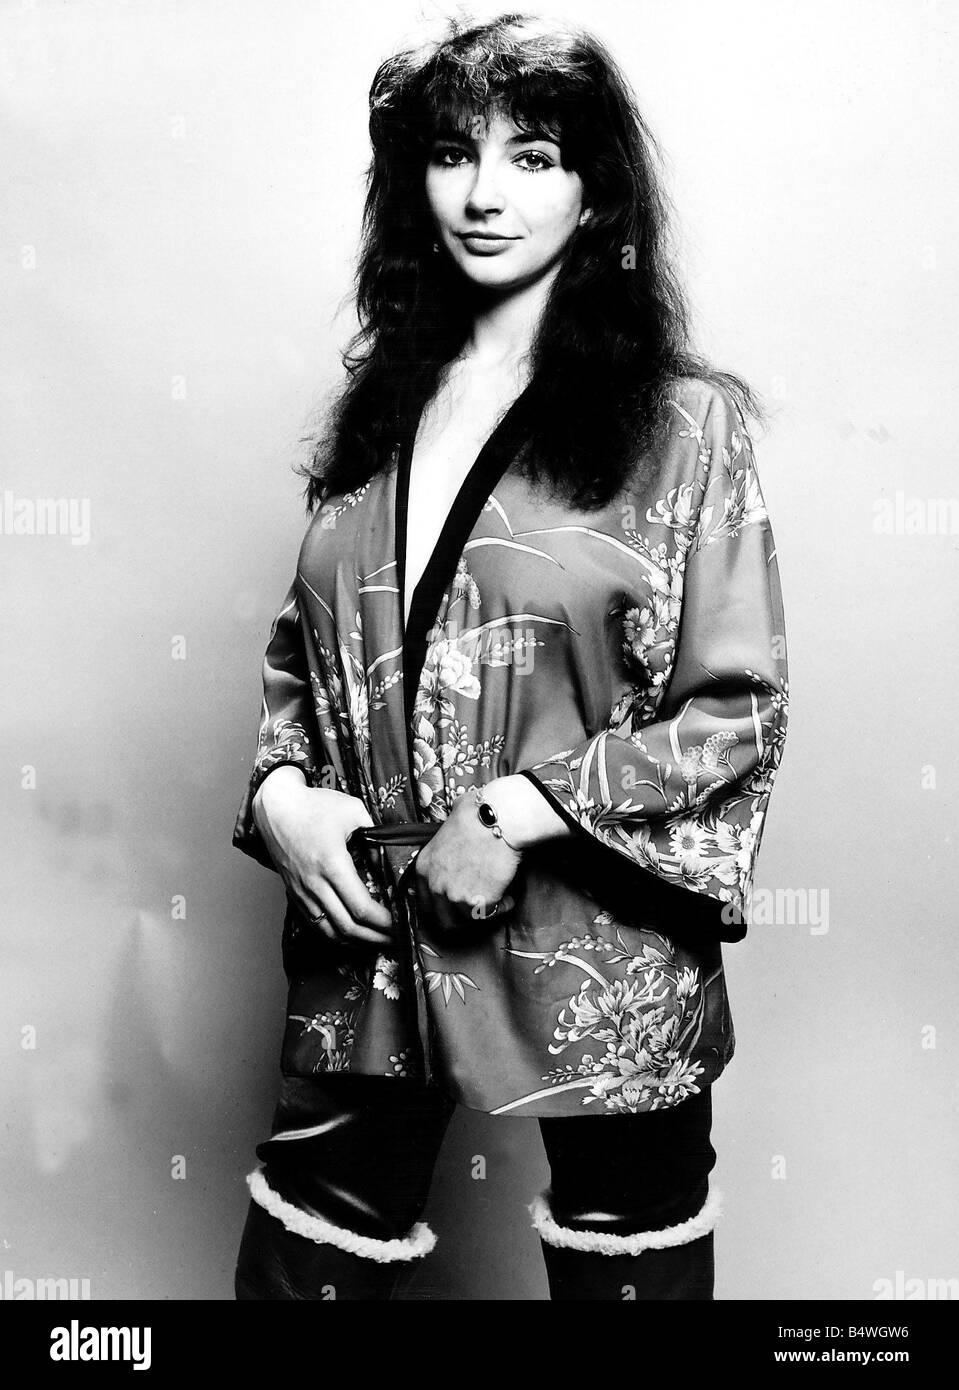 Pop singer Kate Bush poses in the studio wearing a kimono March 1978 - Stock Image